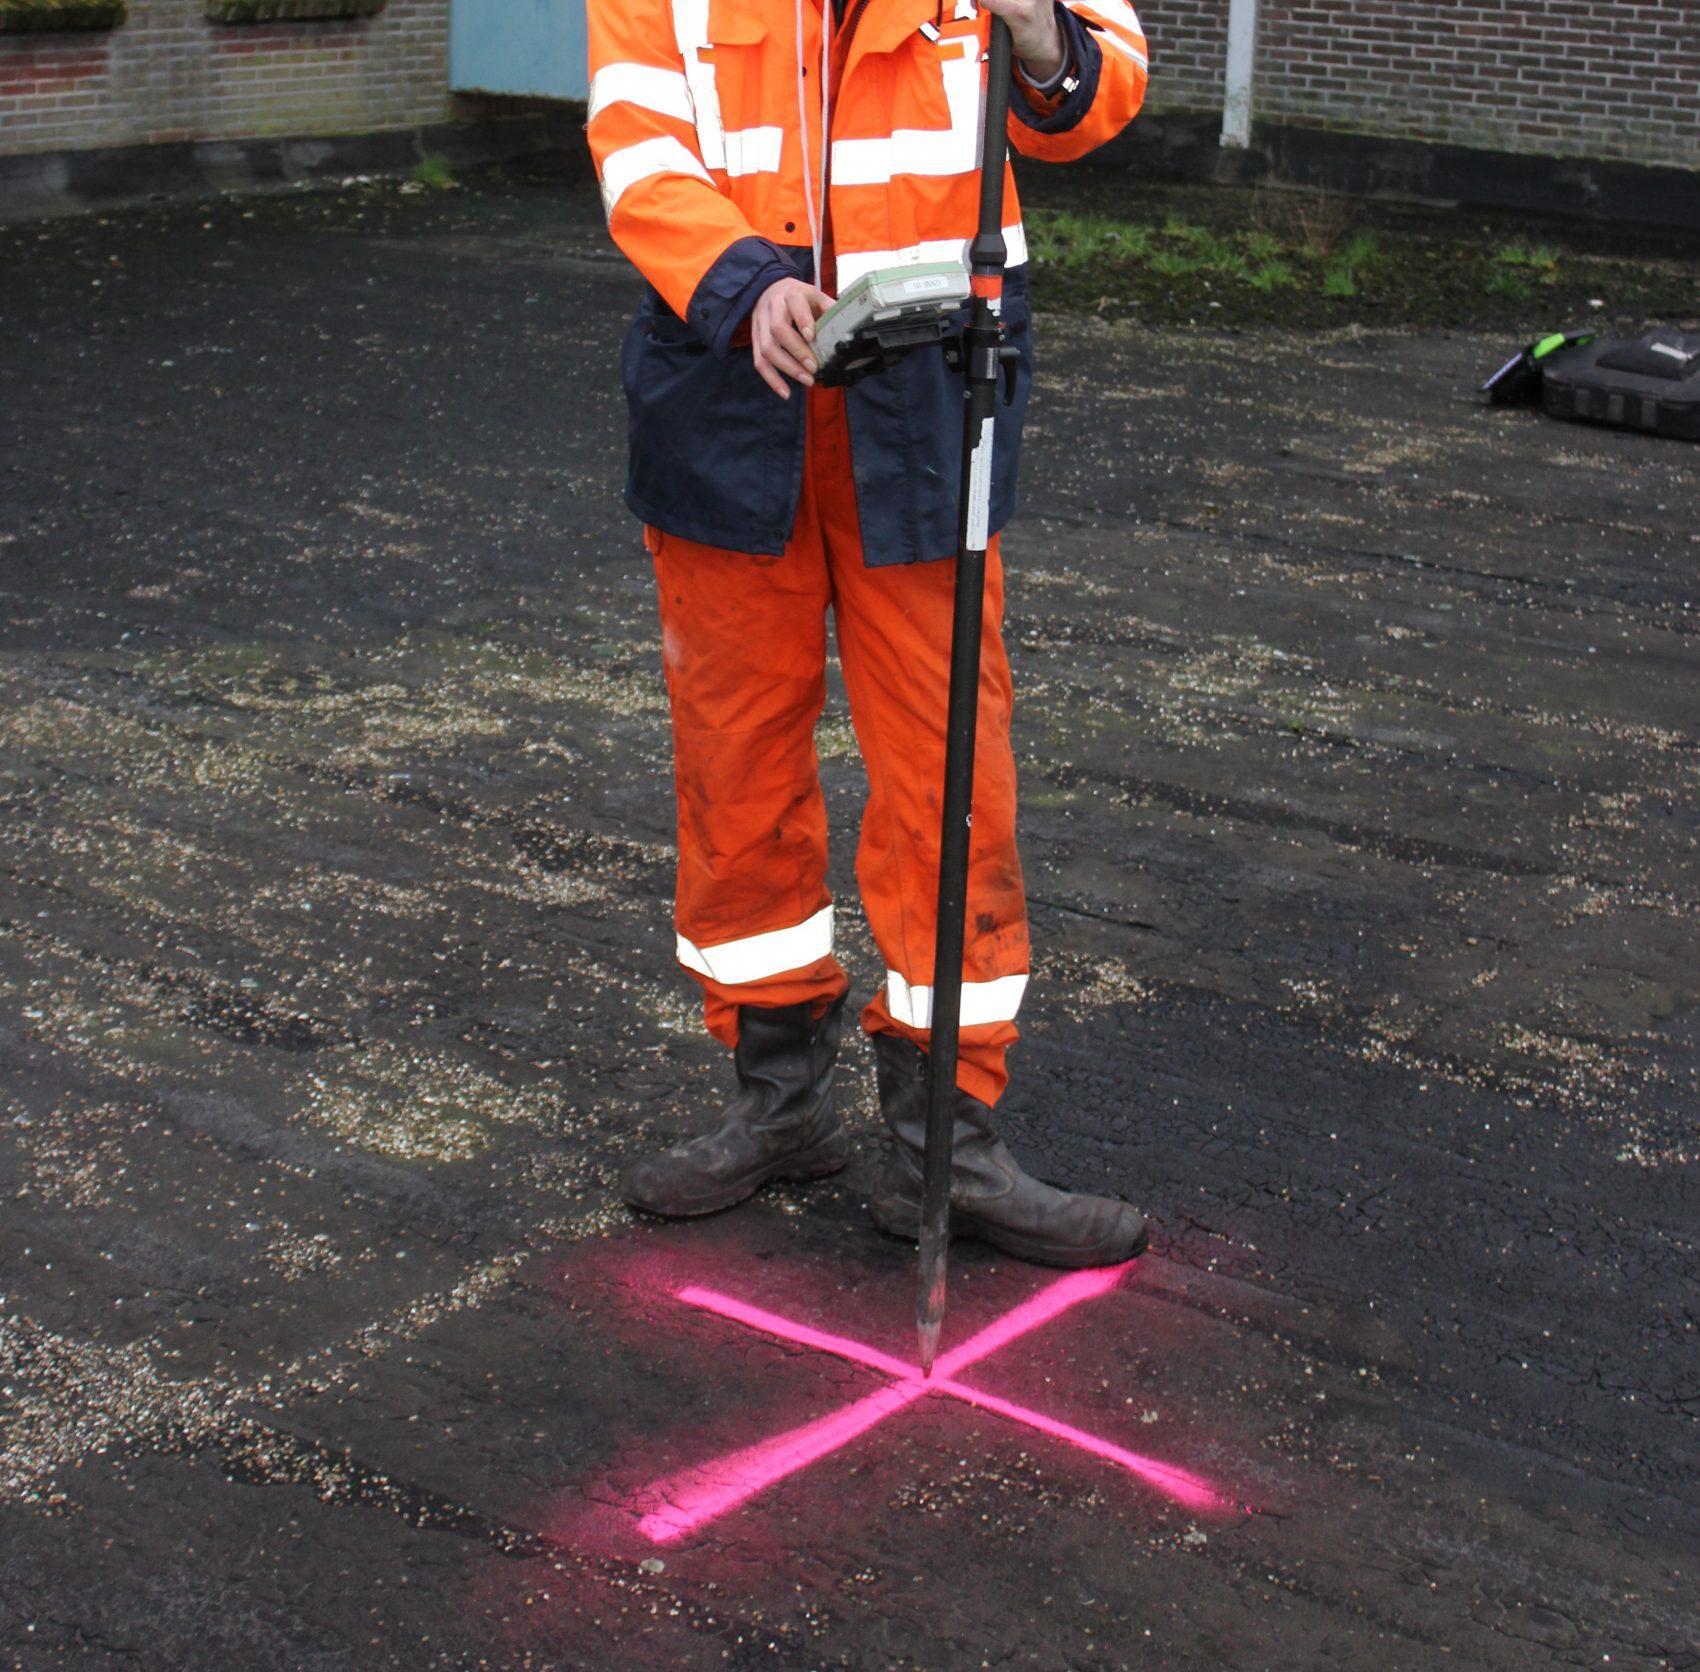 meten groundcontrolpoints